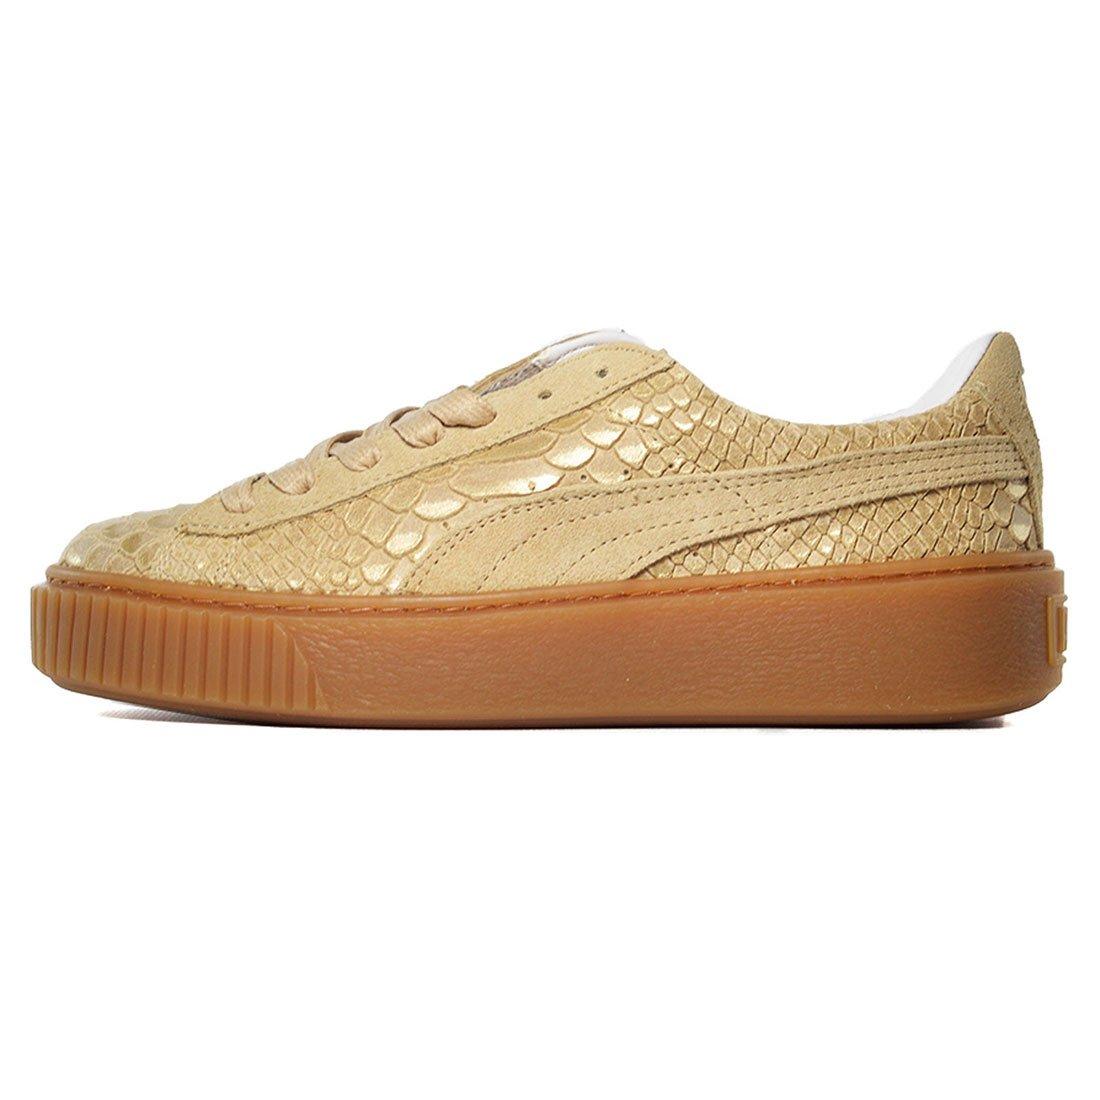 PUMA Women's Platform Sneakers B06XB4KC7T 7 M US Natural Vachetta / Gold